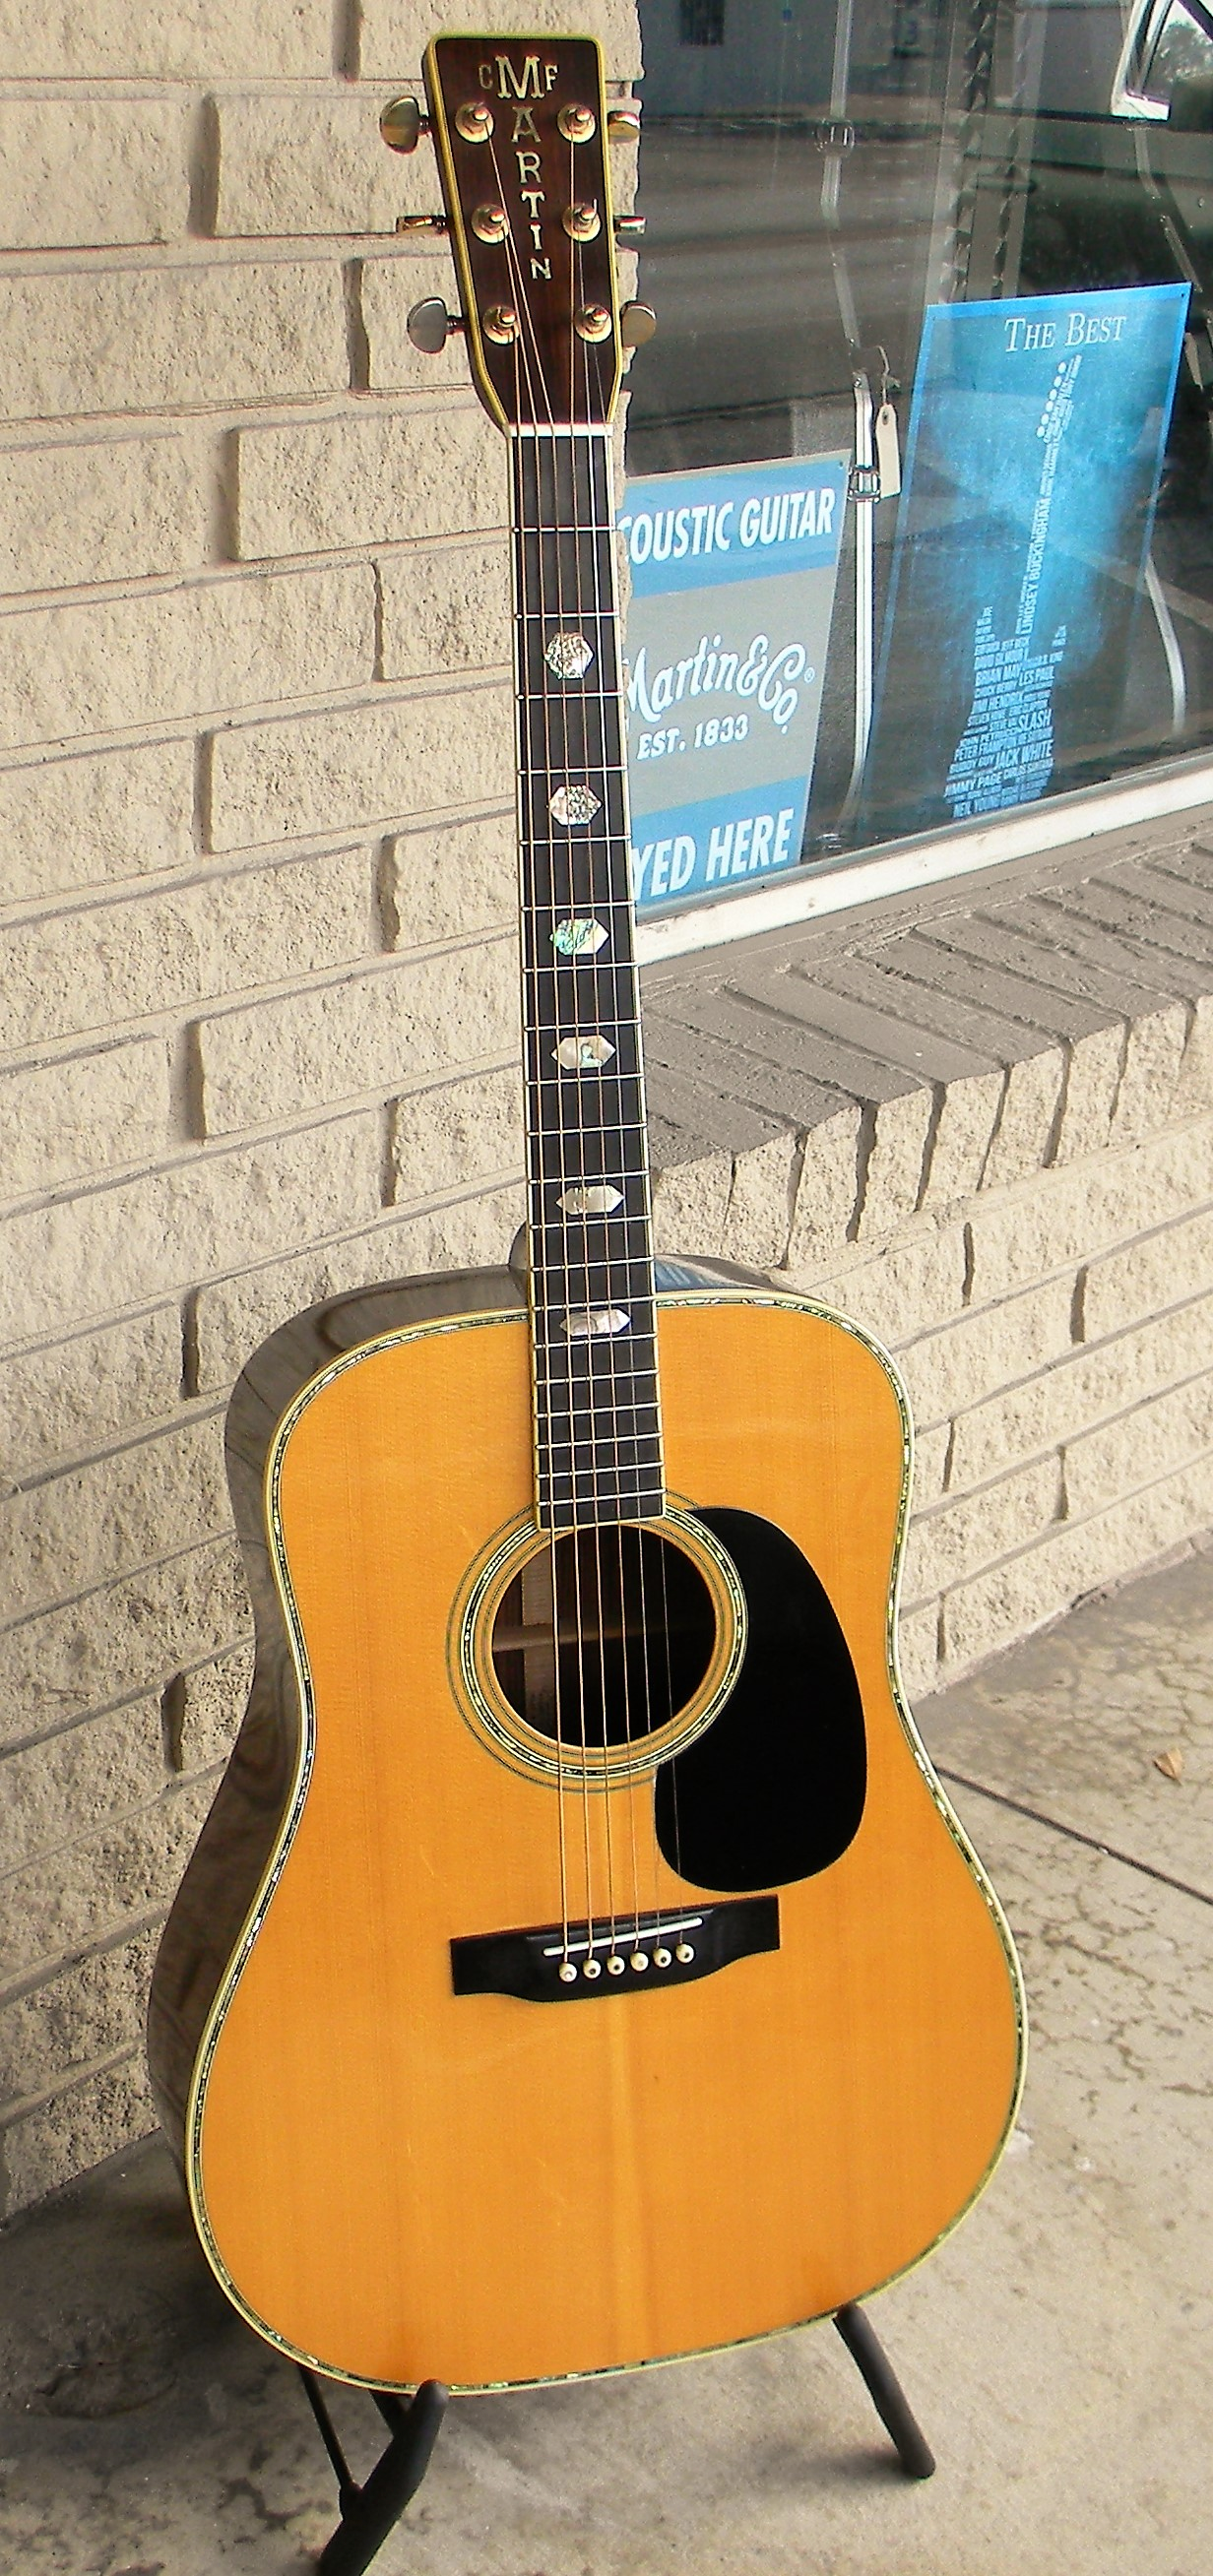 dscn6953 san antonio guitar store guitar tex. Black Bedroom Furniture Sets. Home Design Ideas